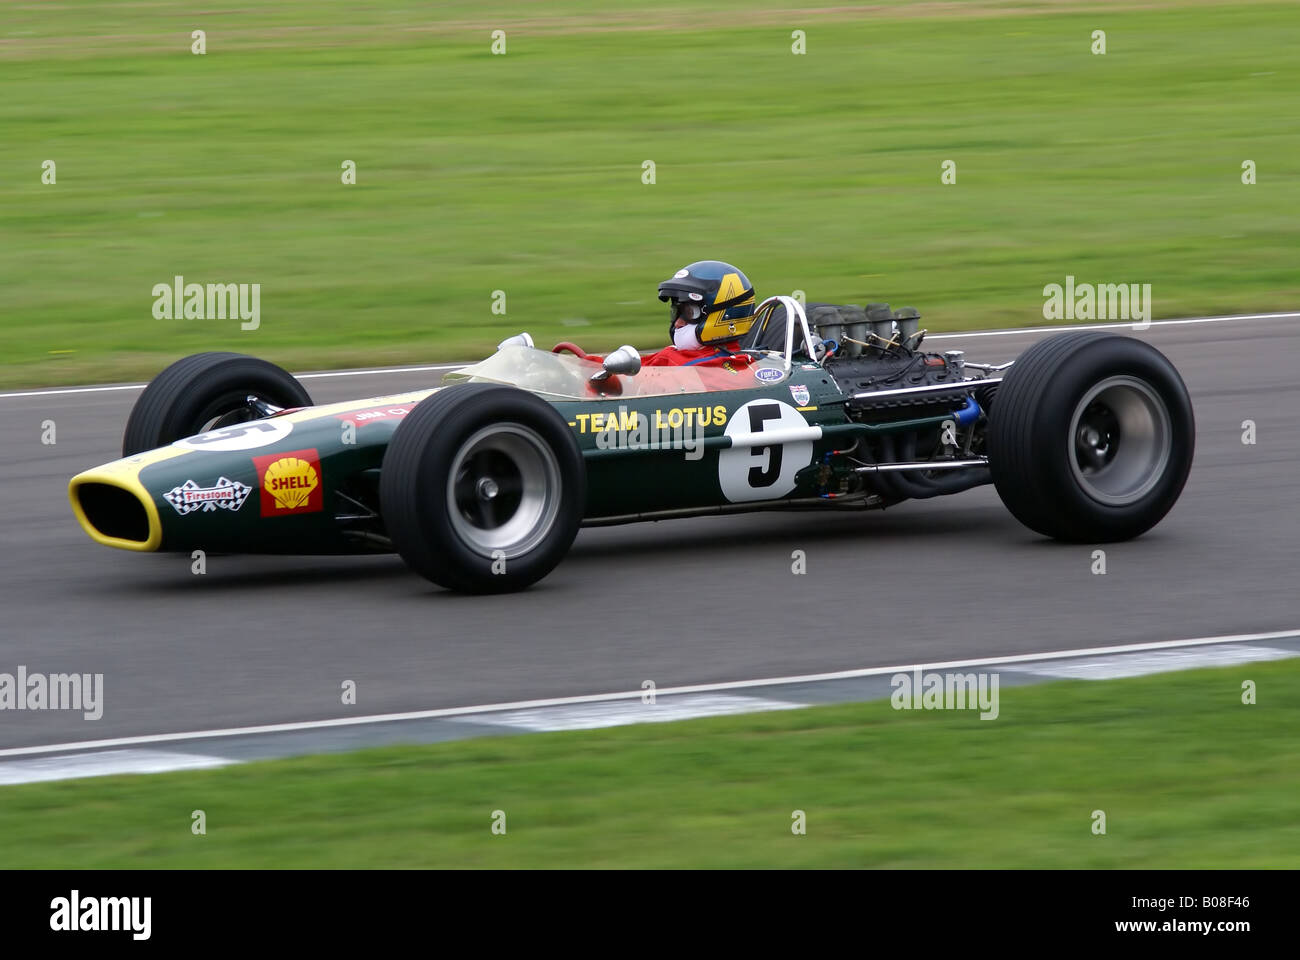 classic lotus formula 1 racing car stock photo 17397862